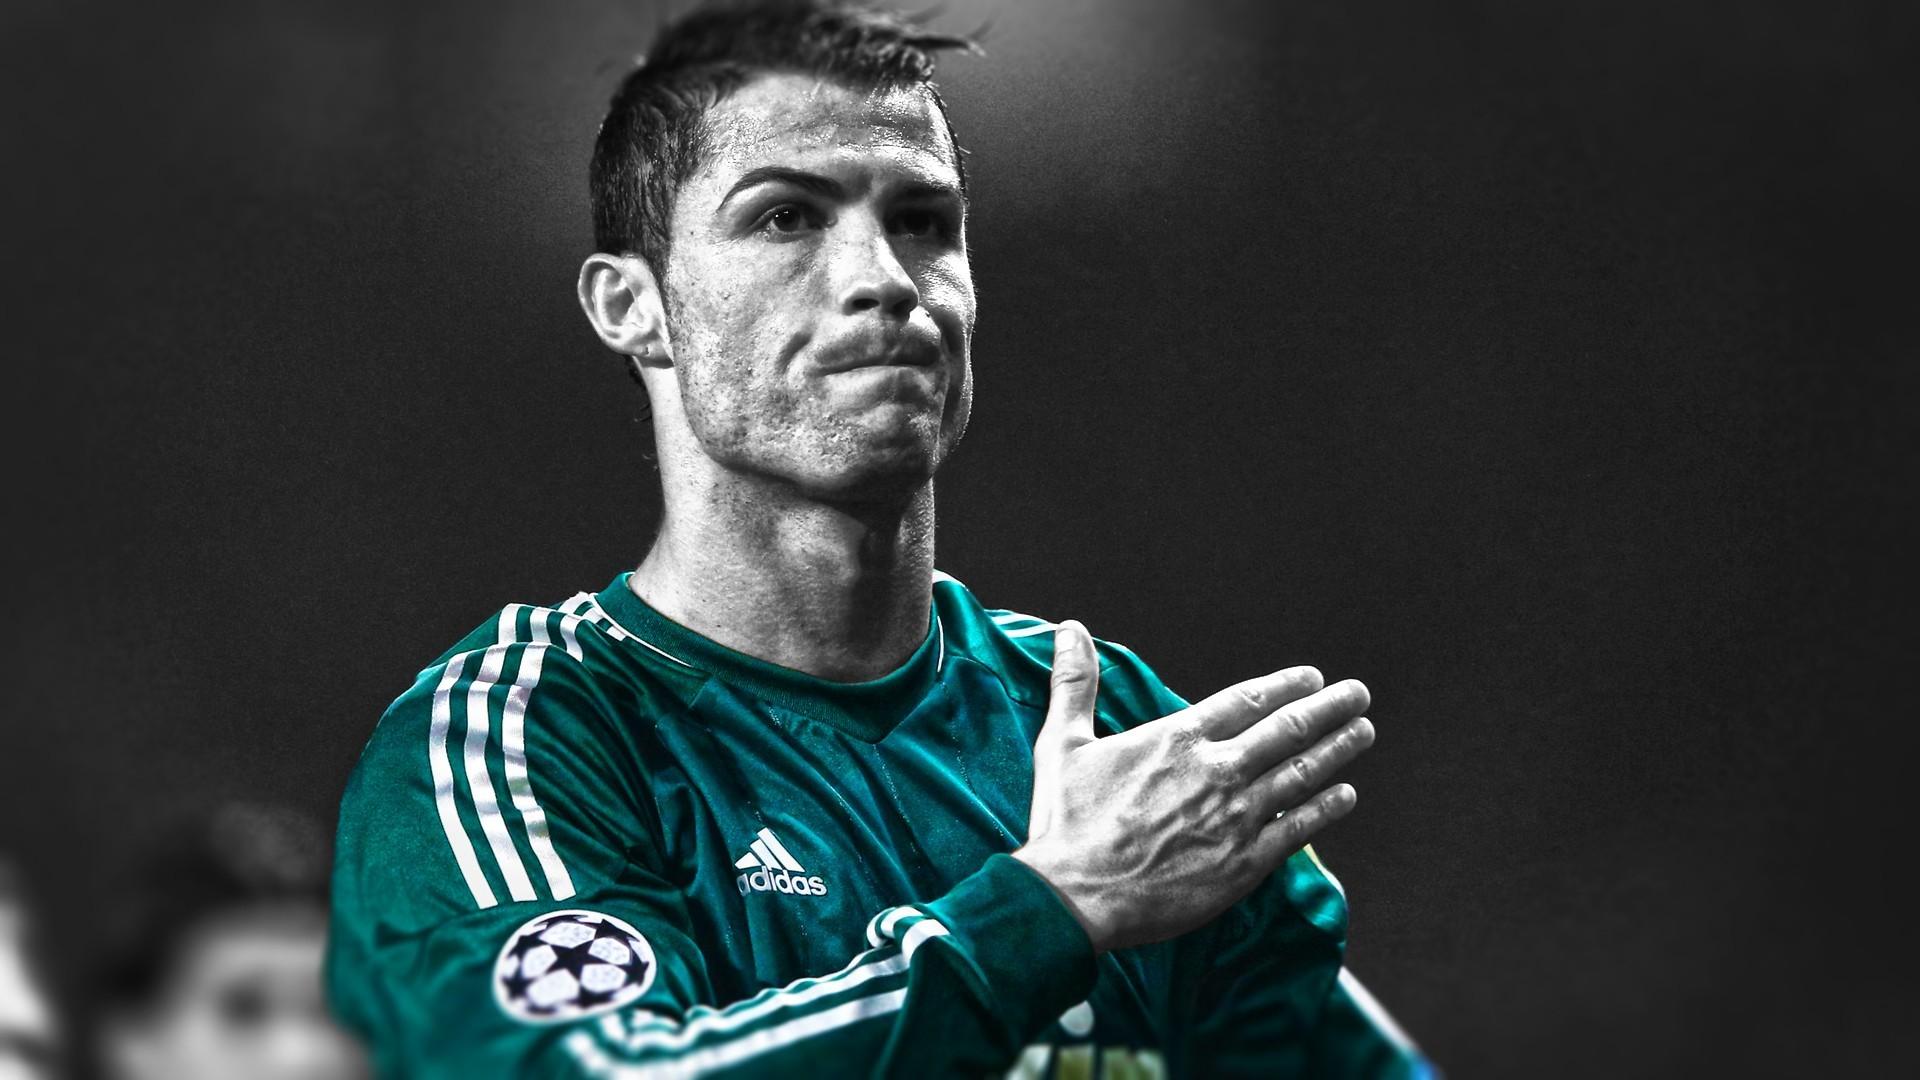 Cristiano Ronaldo HD Wallpapers 2015